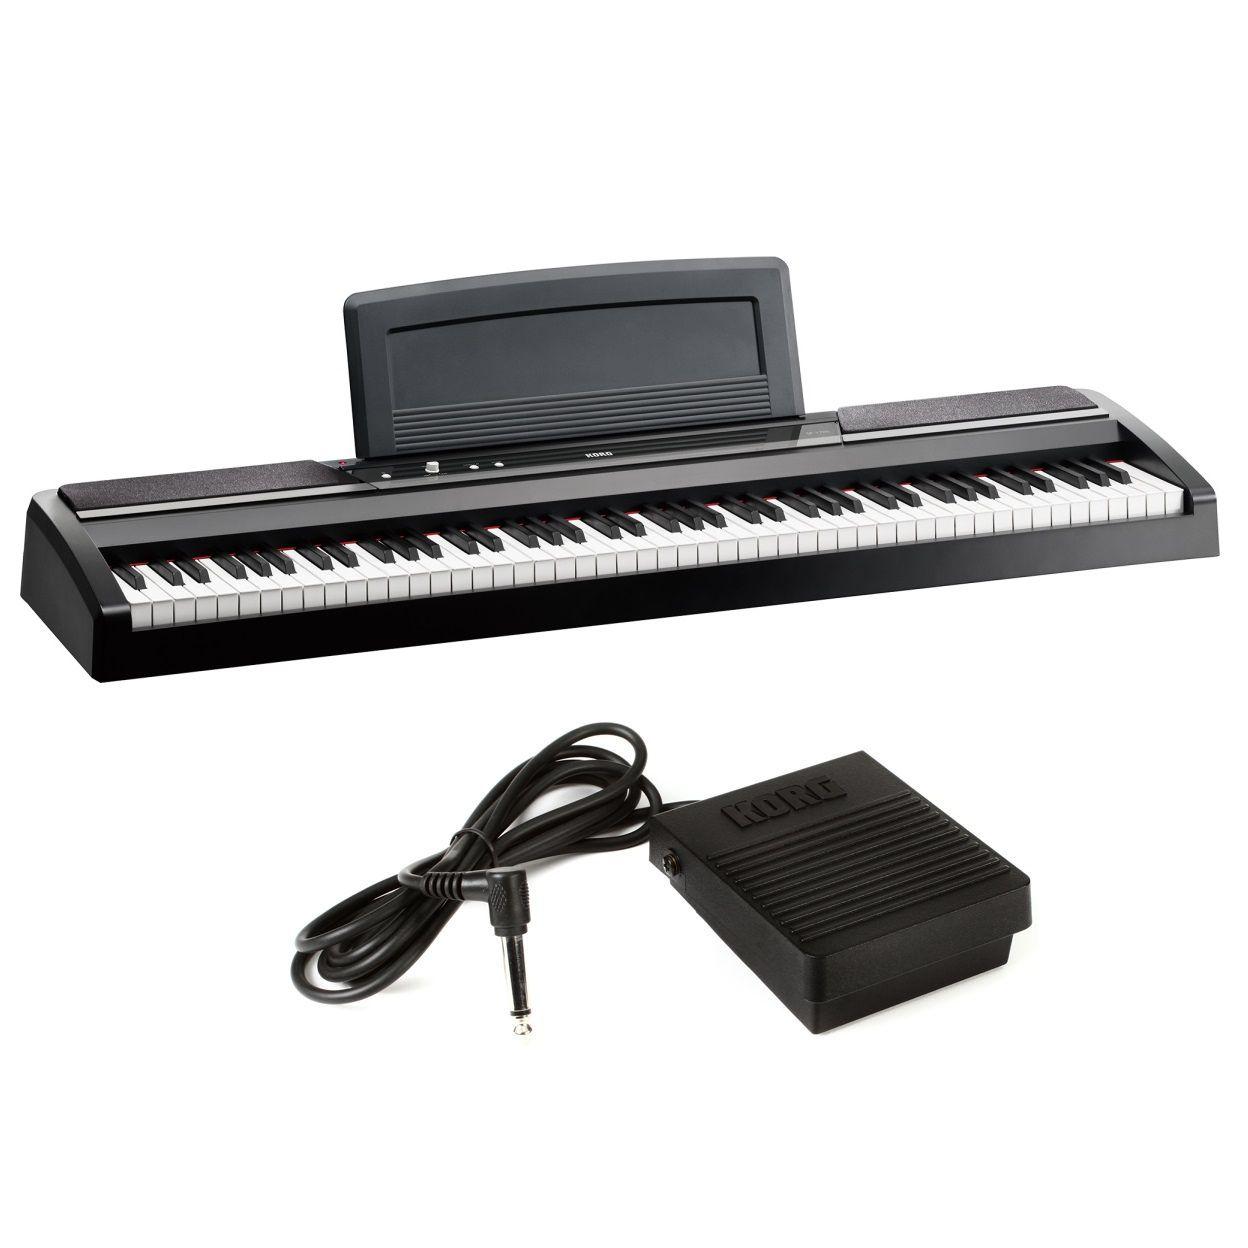 Piano Digital Korg Sp170S Bk 88 Teclas Pesadas